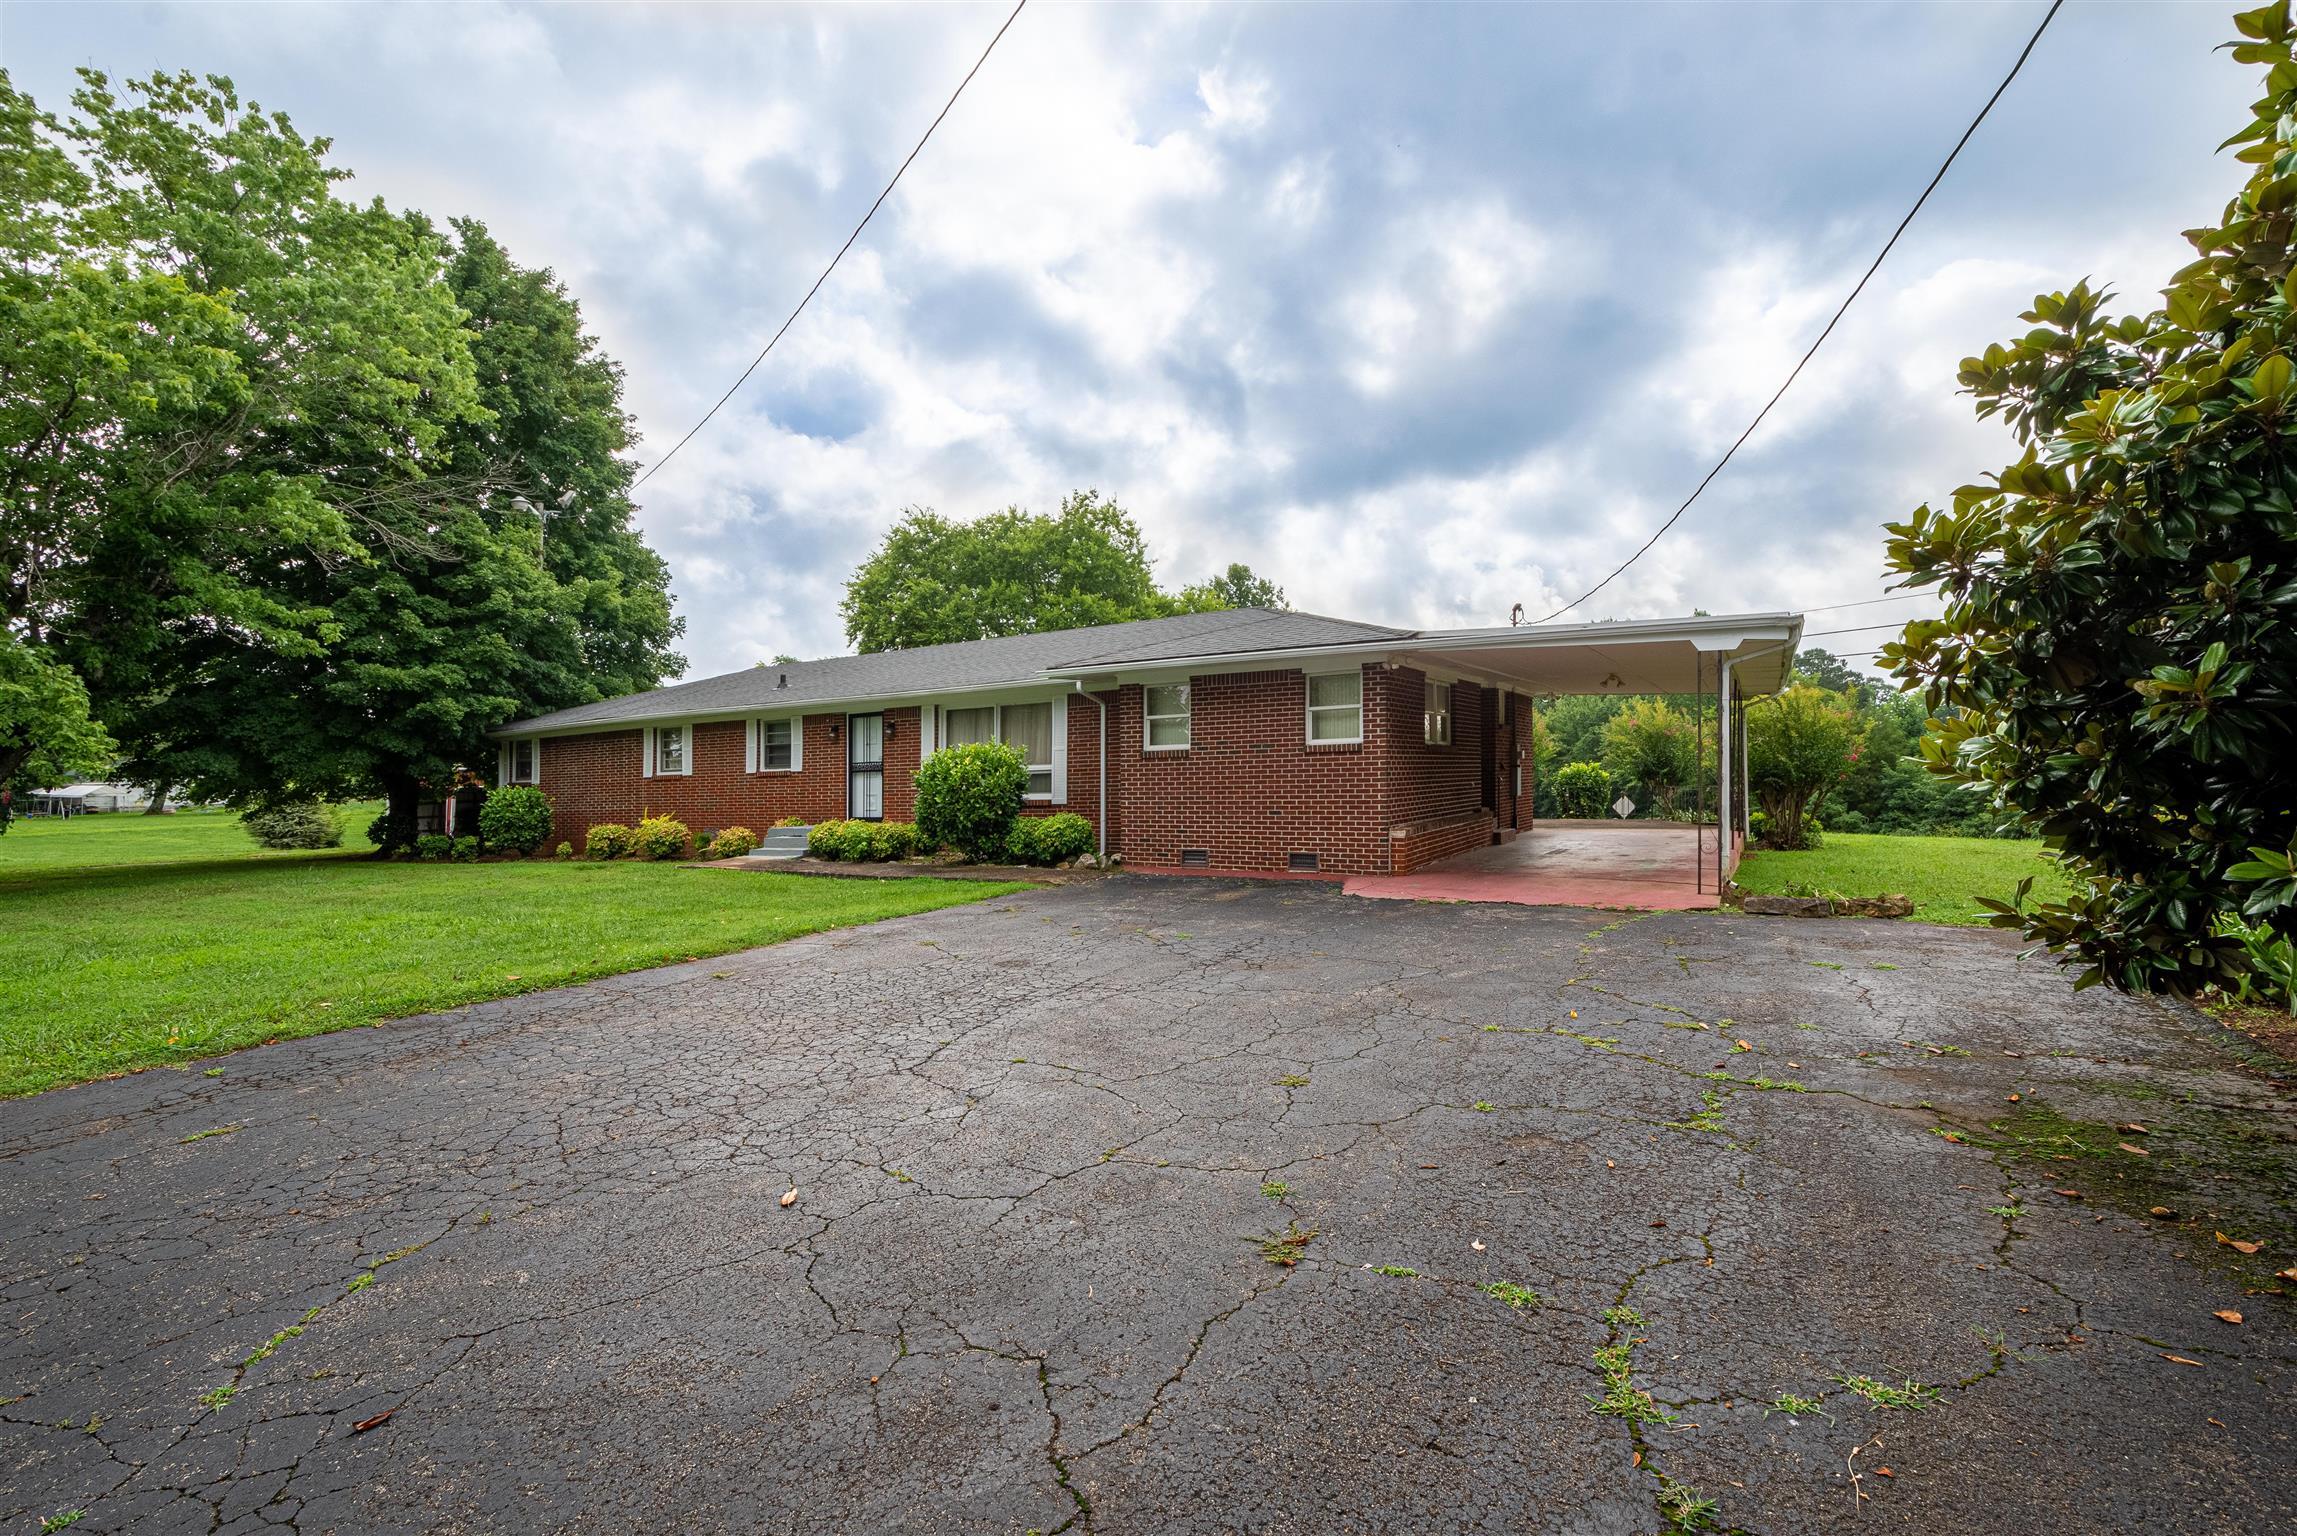 160 Fall River Rd, Goodspring, TN 38460 - Goodspring, TN real estate listing